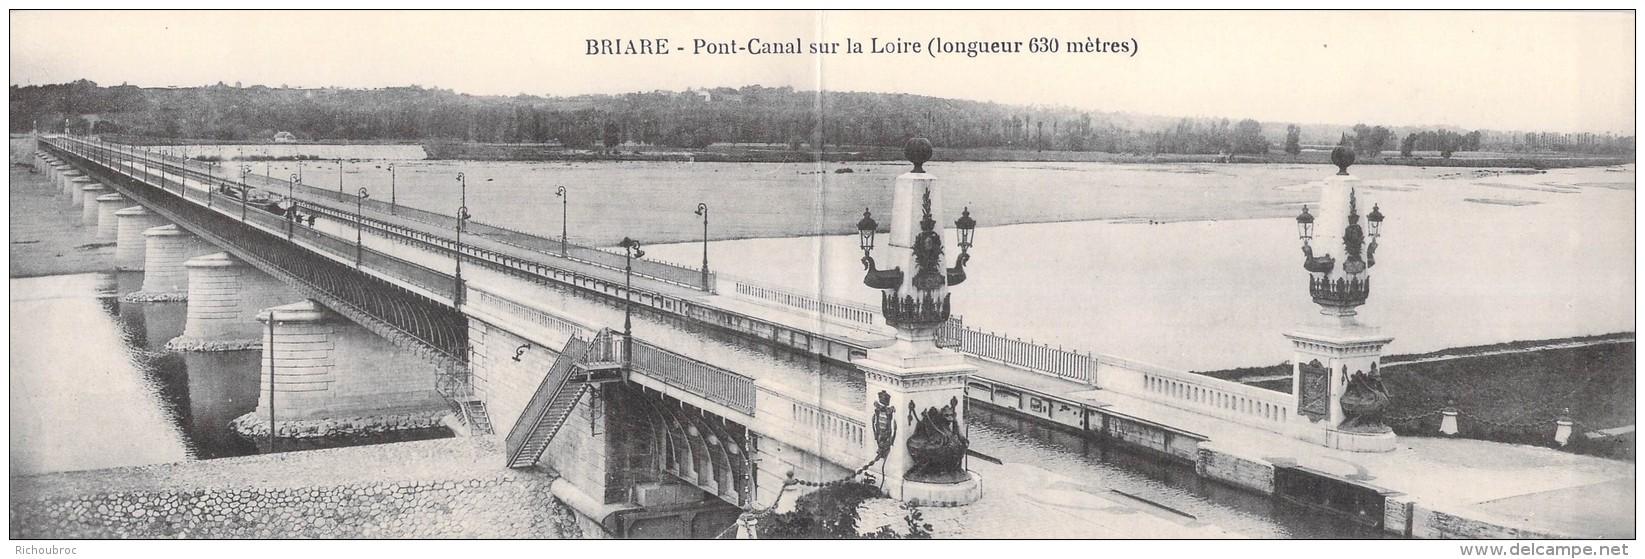 45 BRIARE CARTE DOUBLE PONT CANAL SUR LA LOIRE - Briare